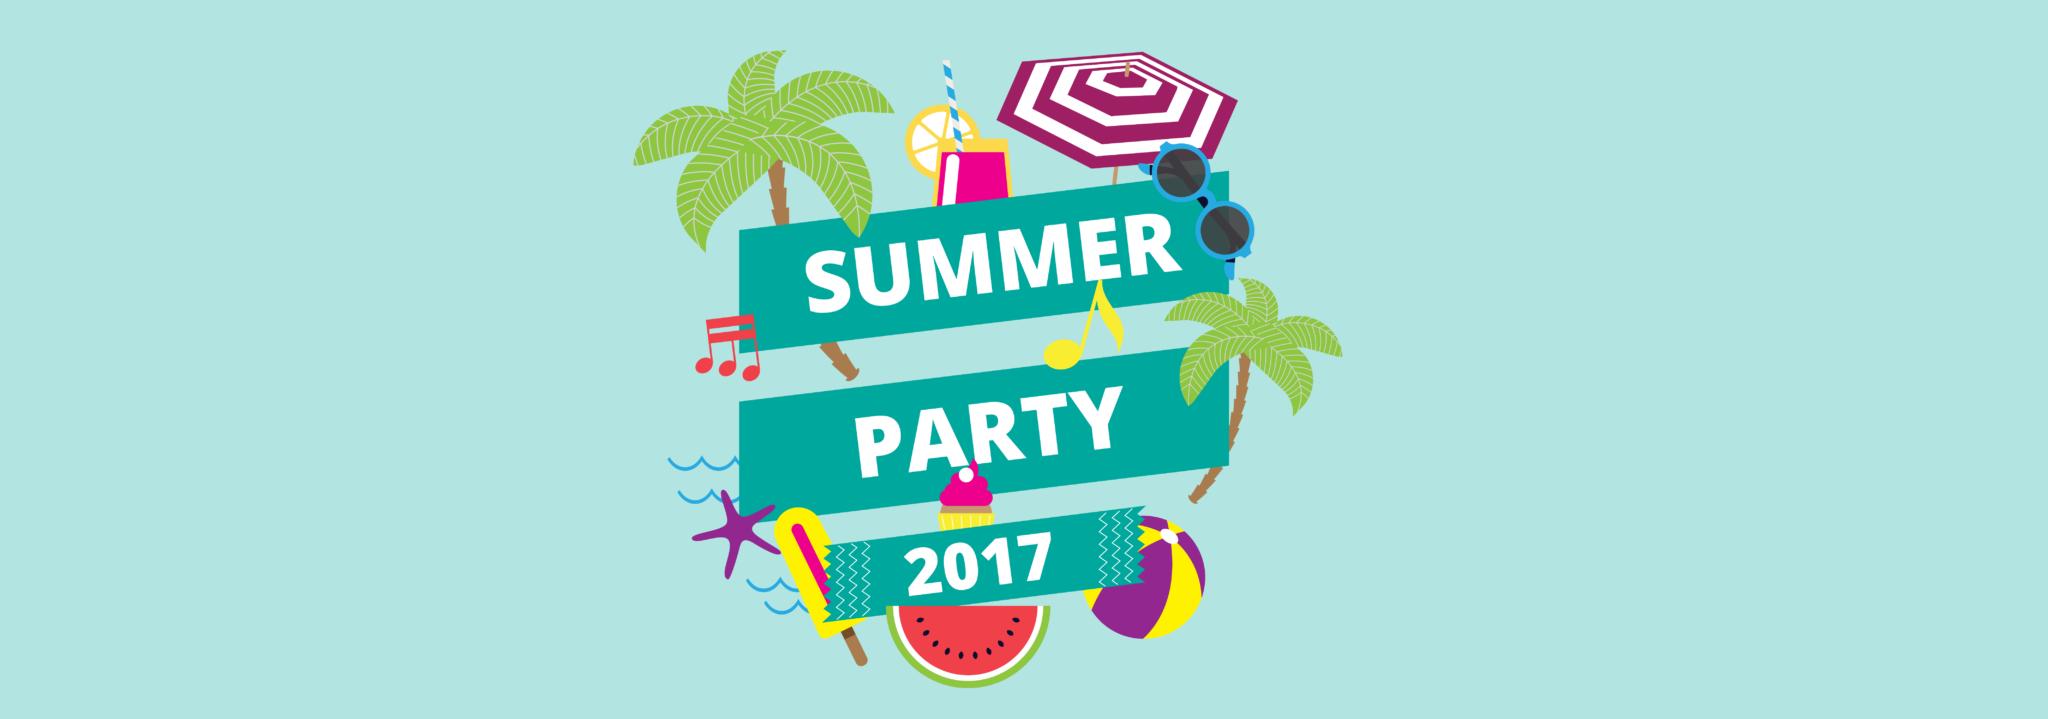 Sydney Summer Party